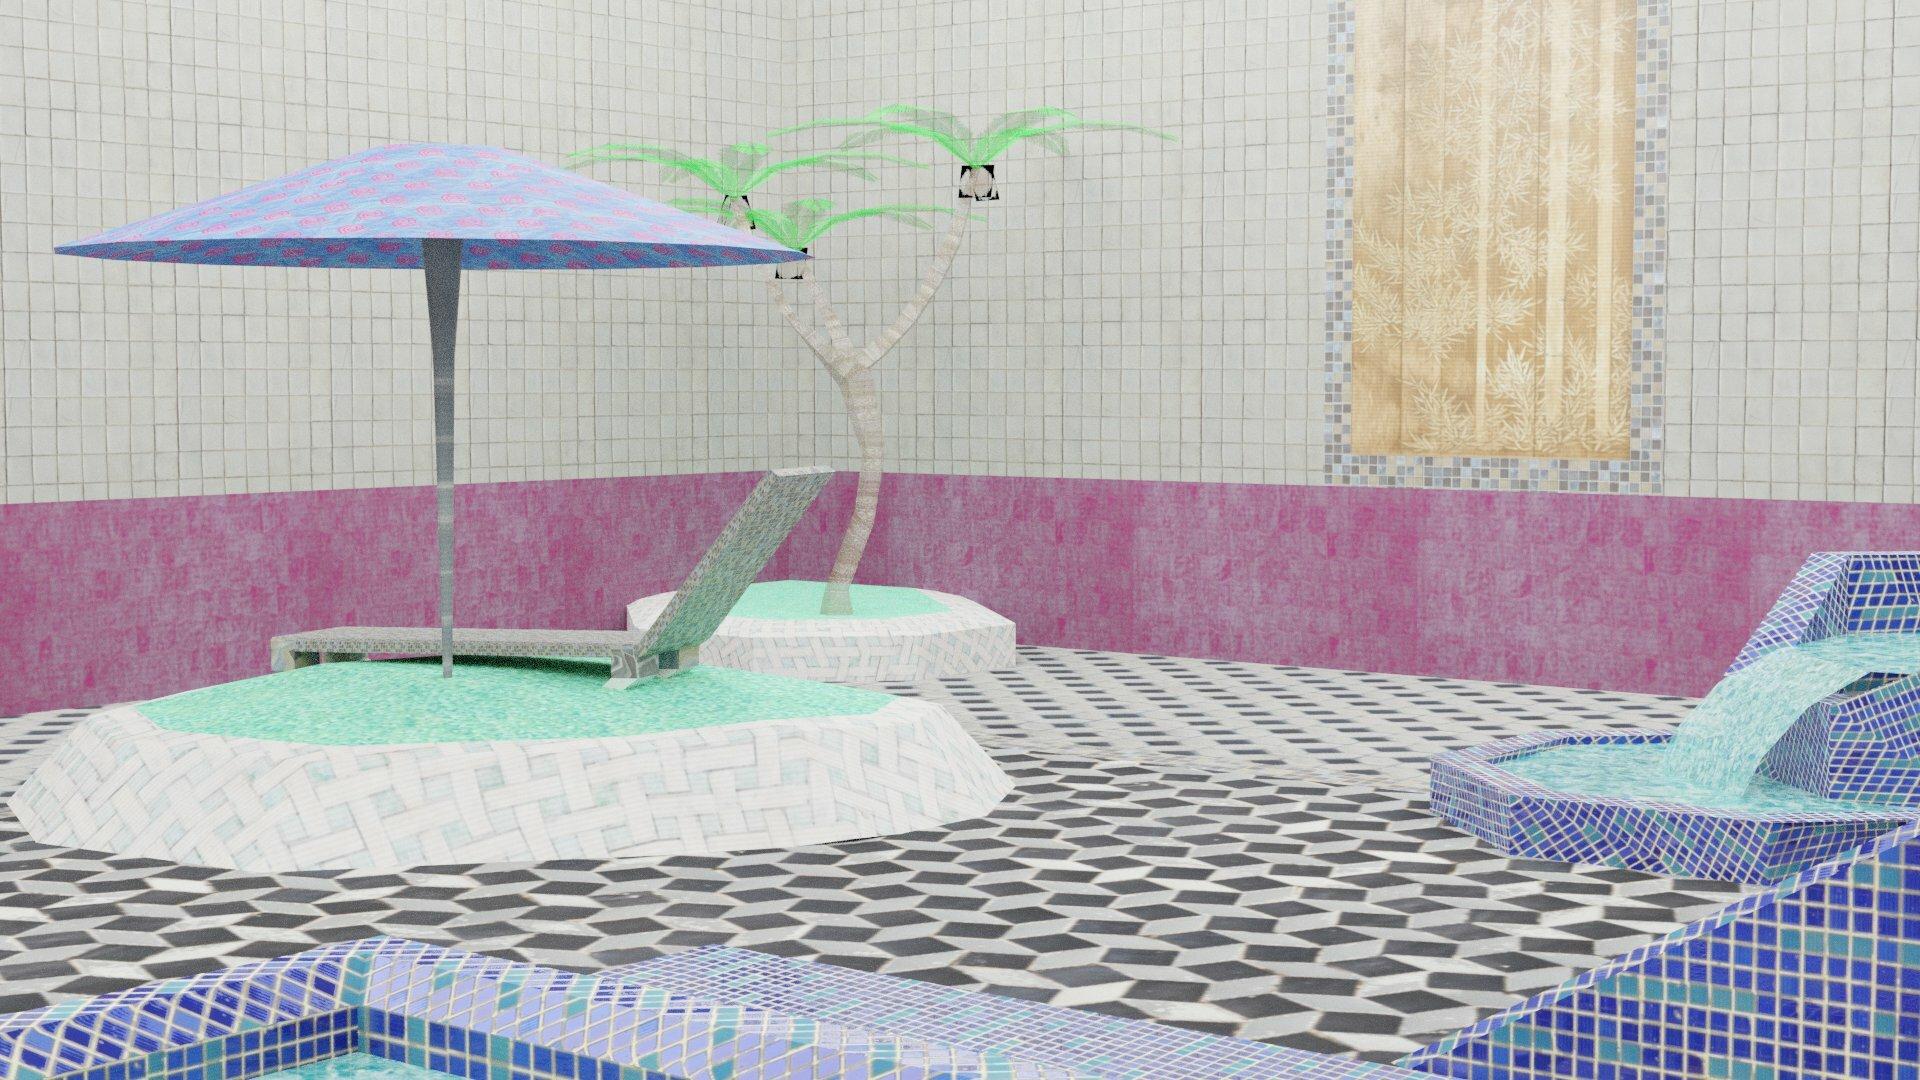 Bathhouse pt1